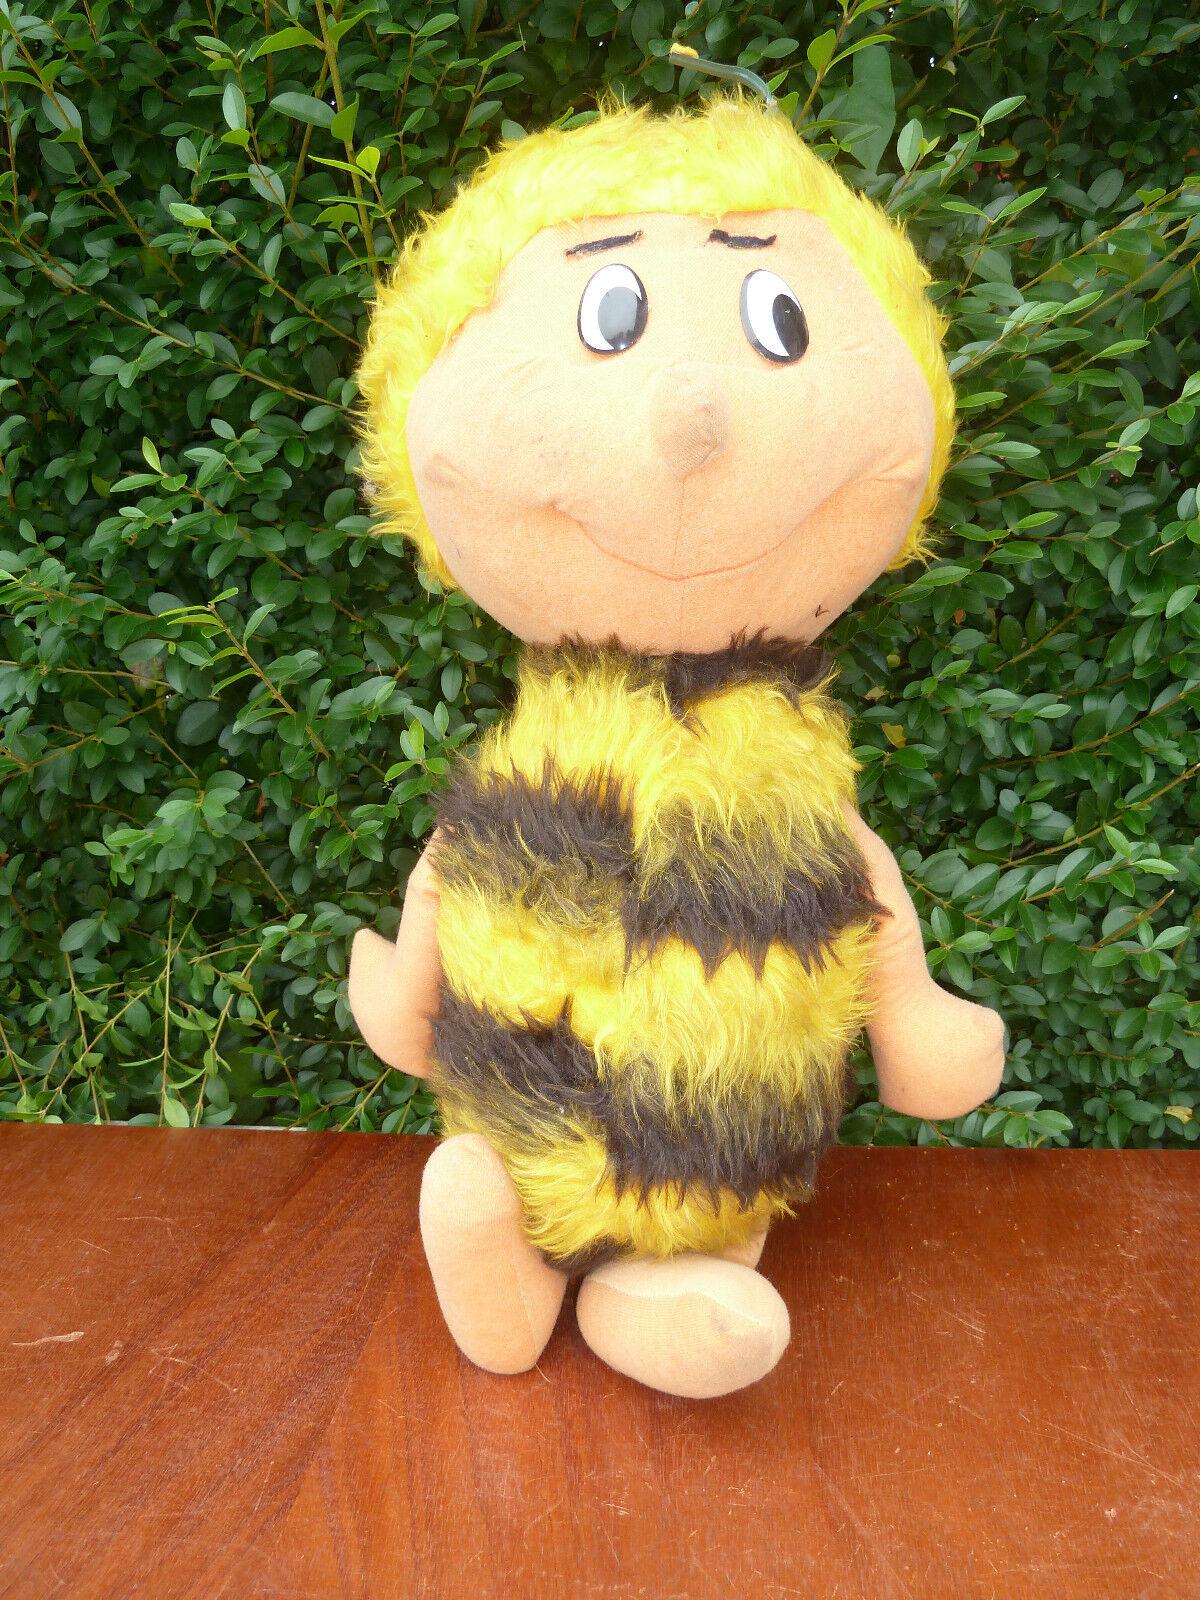 Gran peluche MAYA la abeja antiguo juguete, vintage